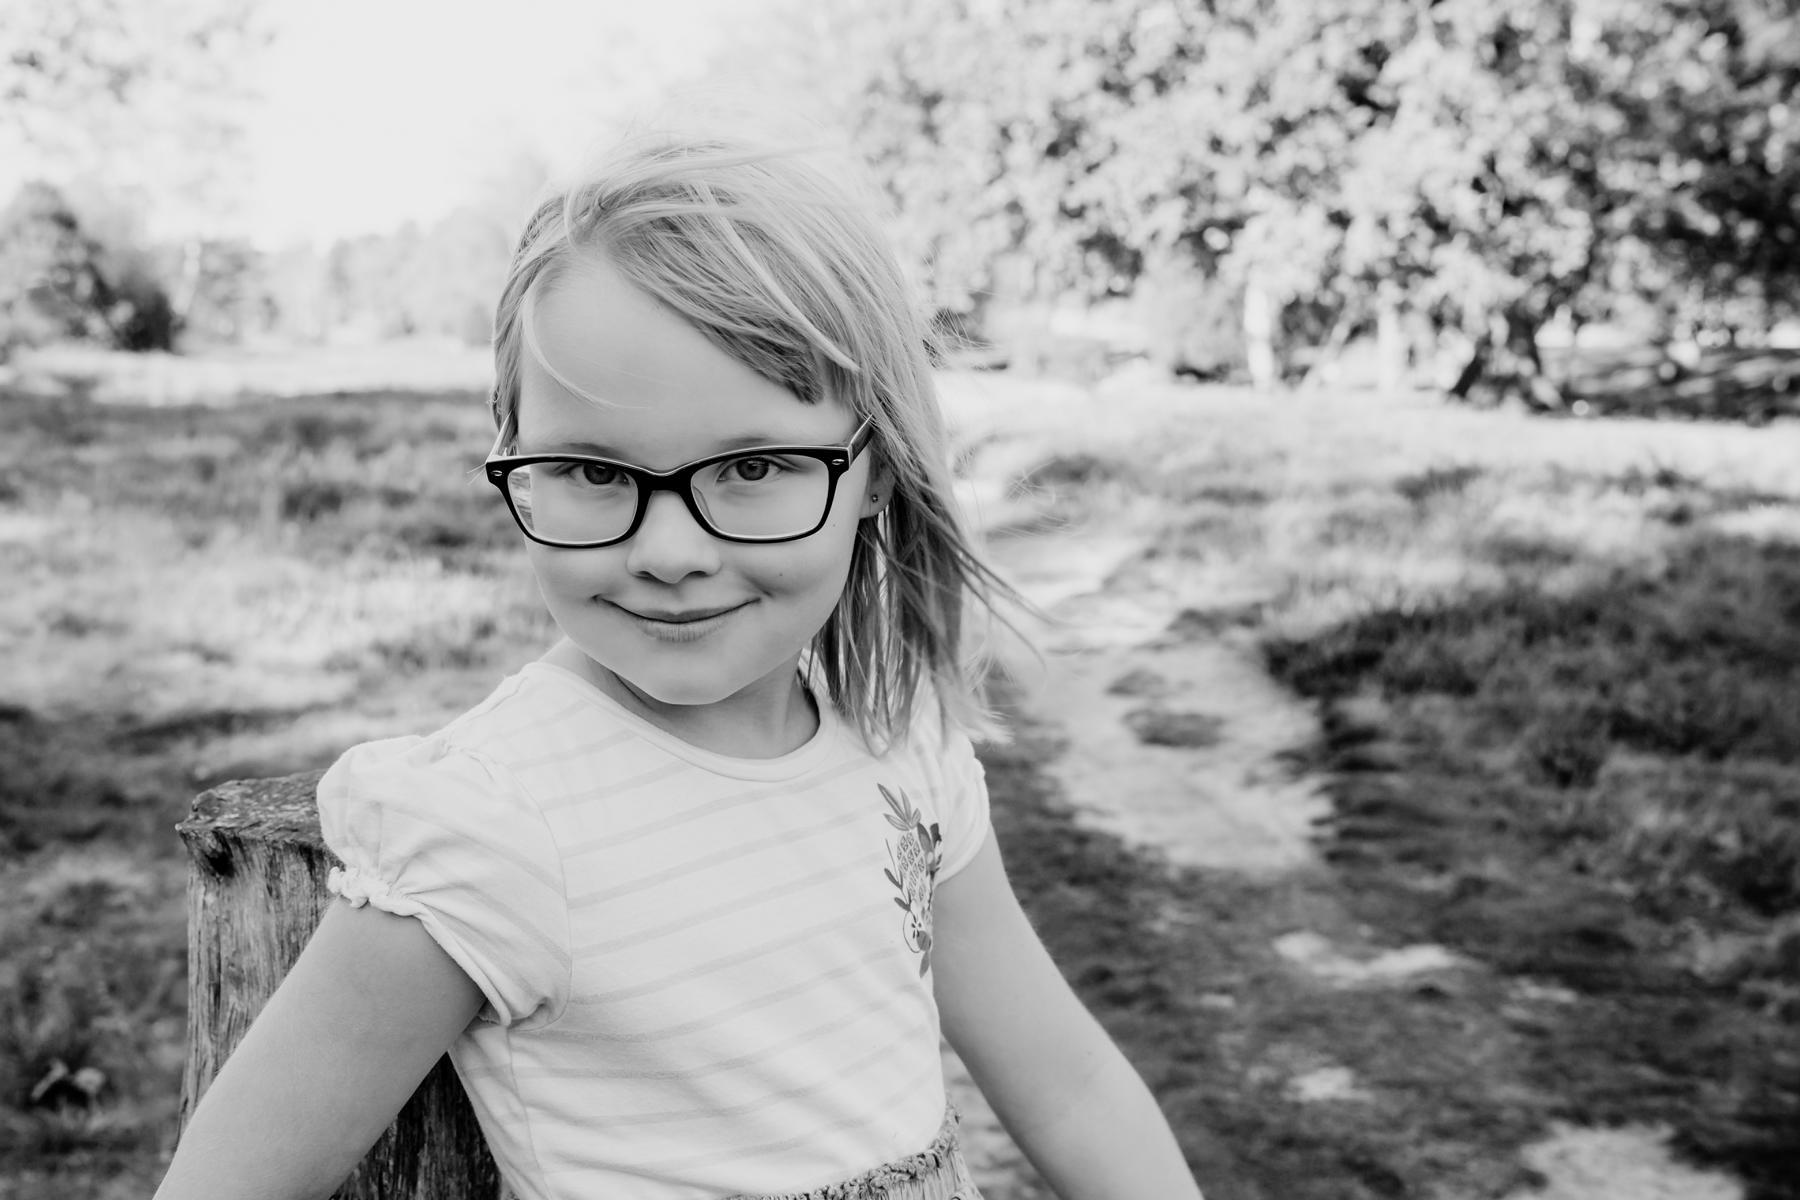 Kinderfotografie Rotenburg Wümme | Kinderfotos Schneverdingen | Kindershooting Tostedt | Familienbilder Buchholz in der Nordheide | Familienfotograf Soltau